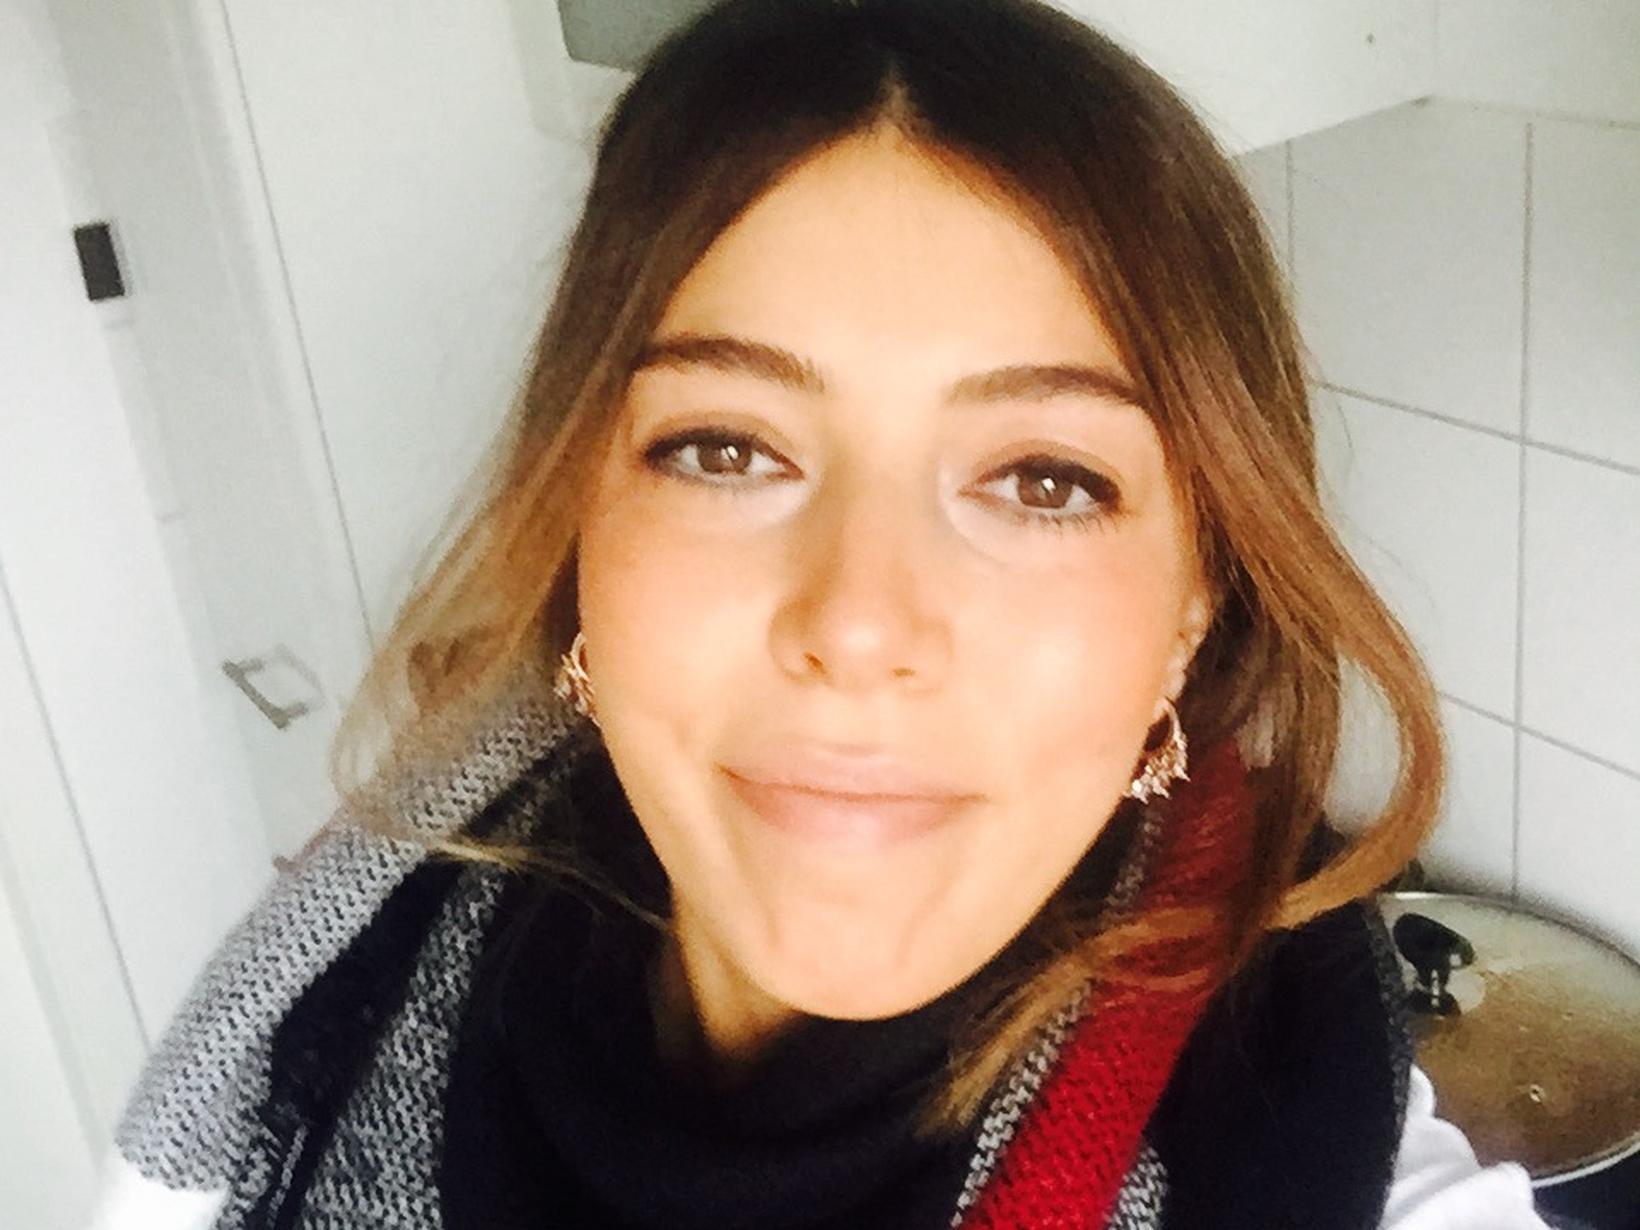 Deniz from London, United Kingdom